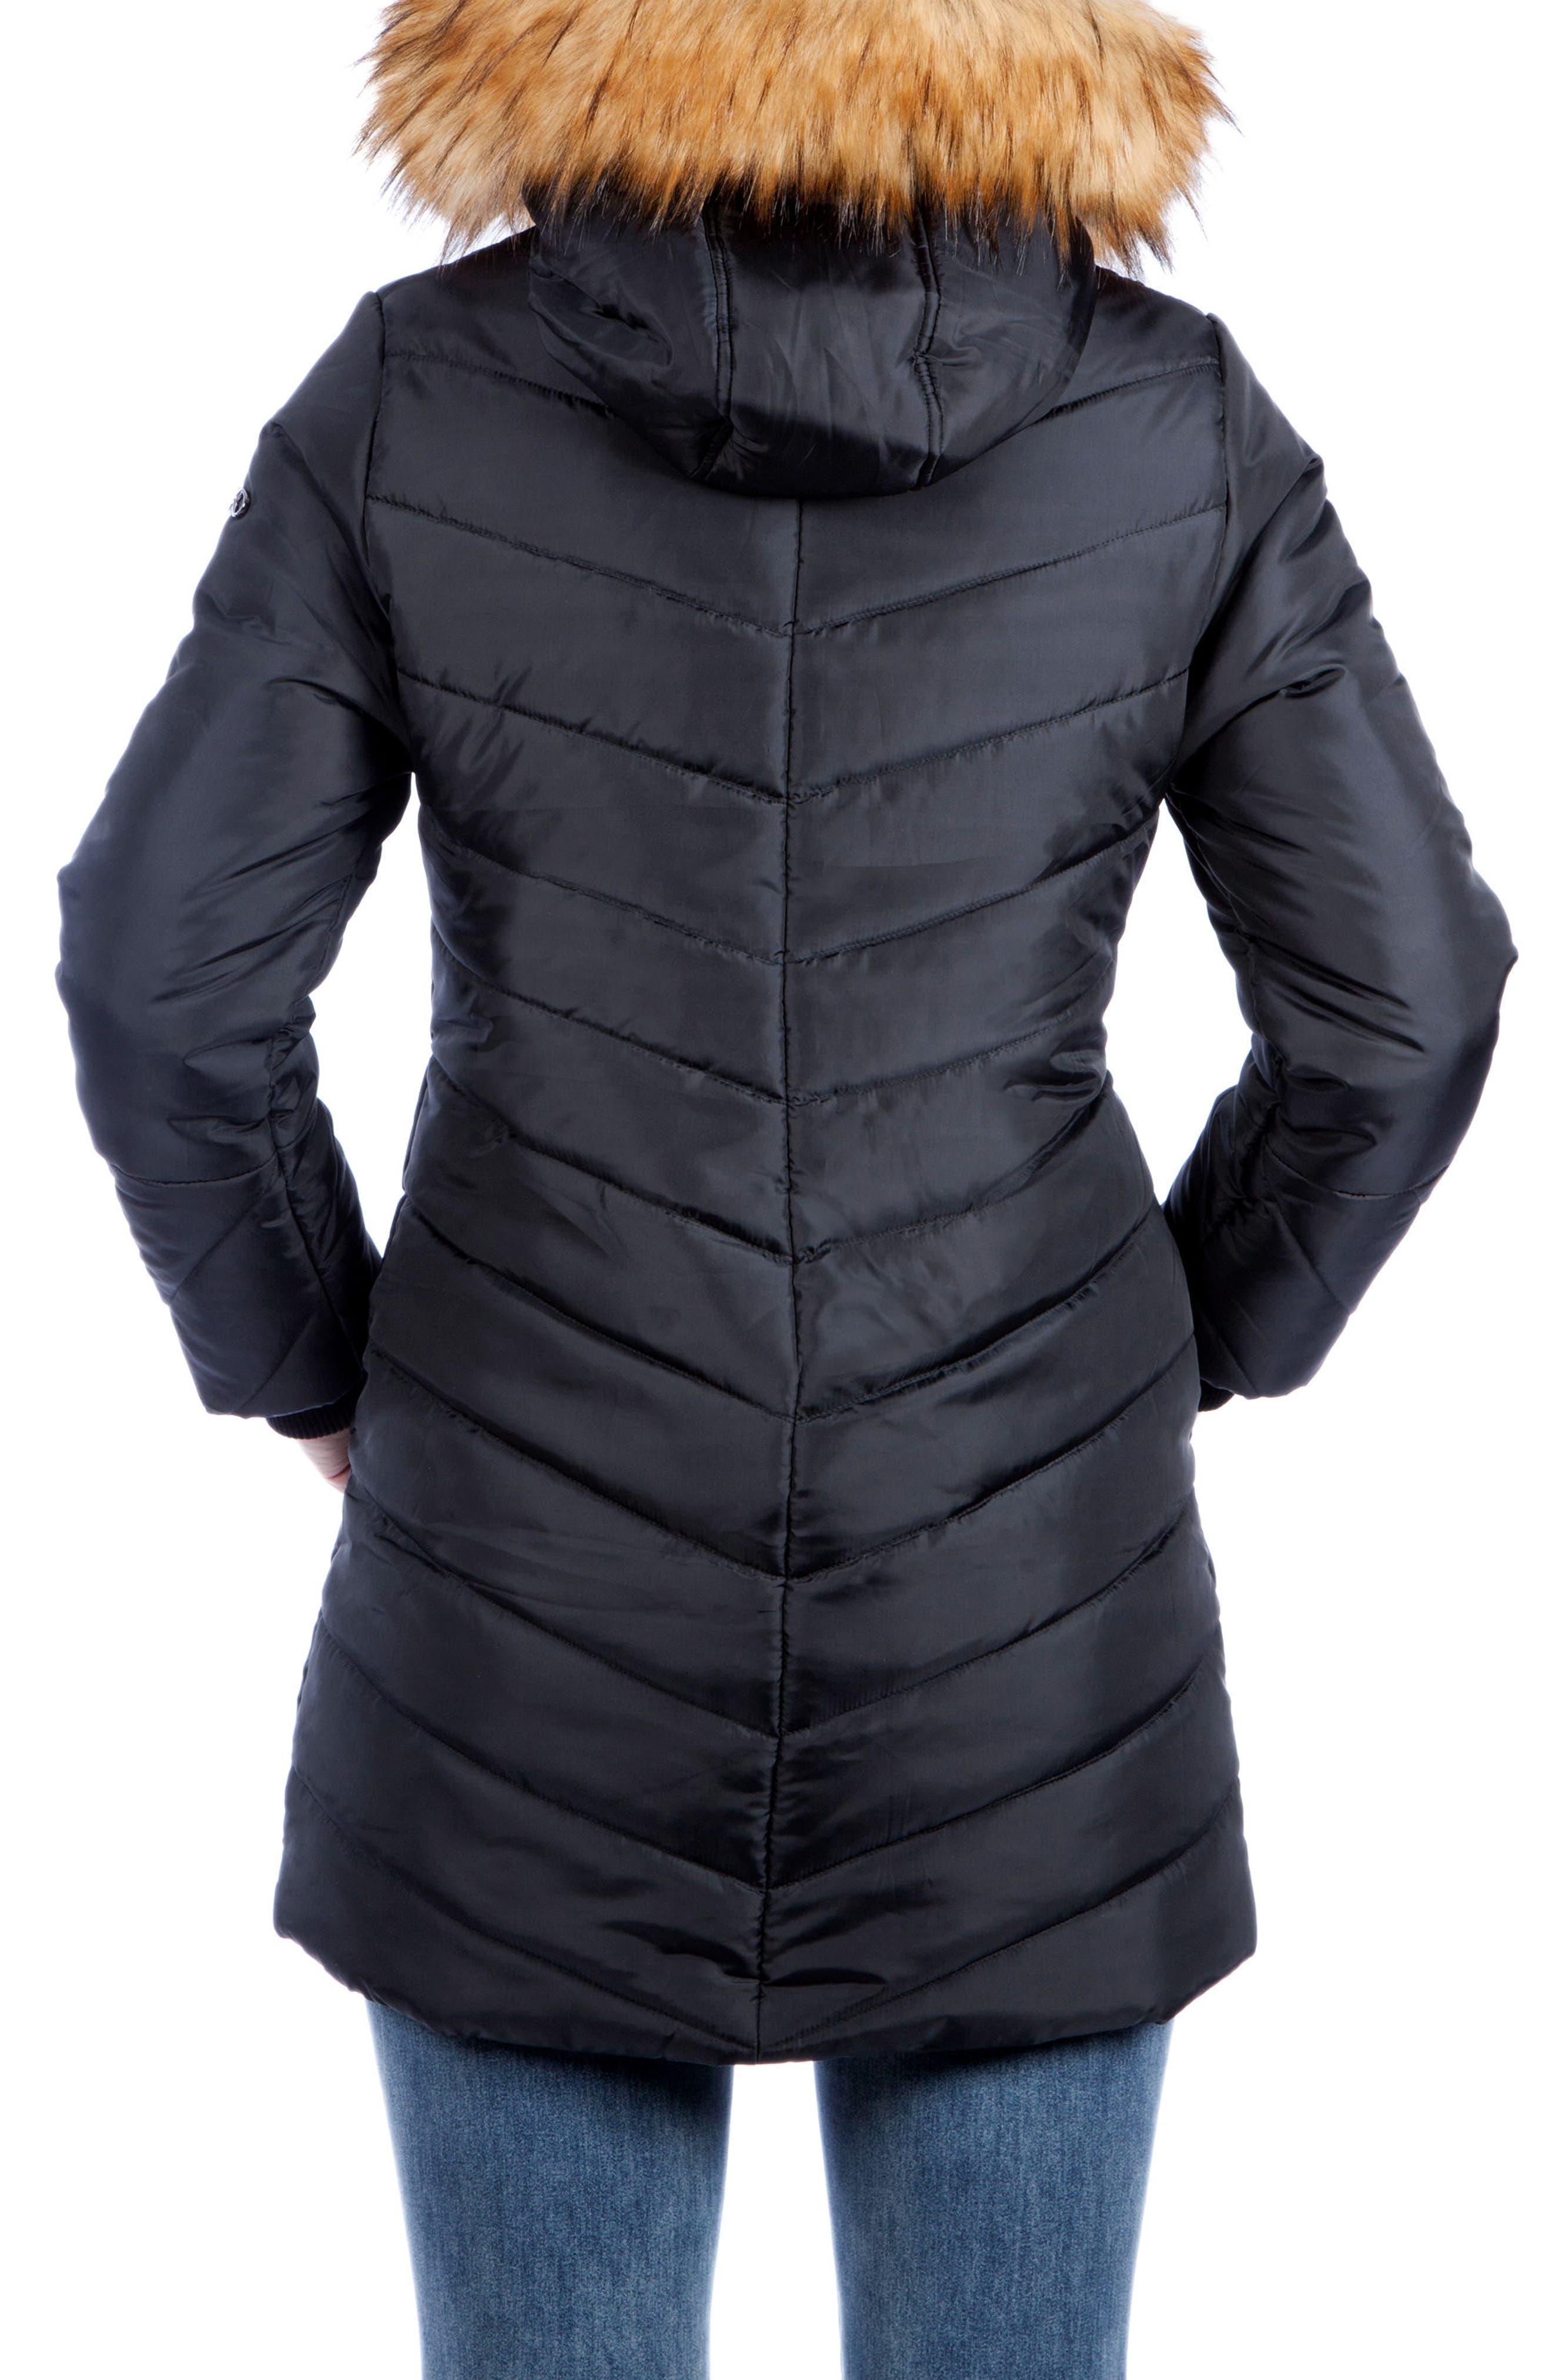 MODERN ETERNITY, Faux Fur Trim Convertible Puffer 3-in-1 Maternity Jacket, Alternate thumbnail 3, color, BLACK